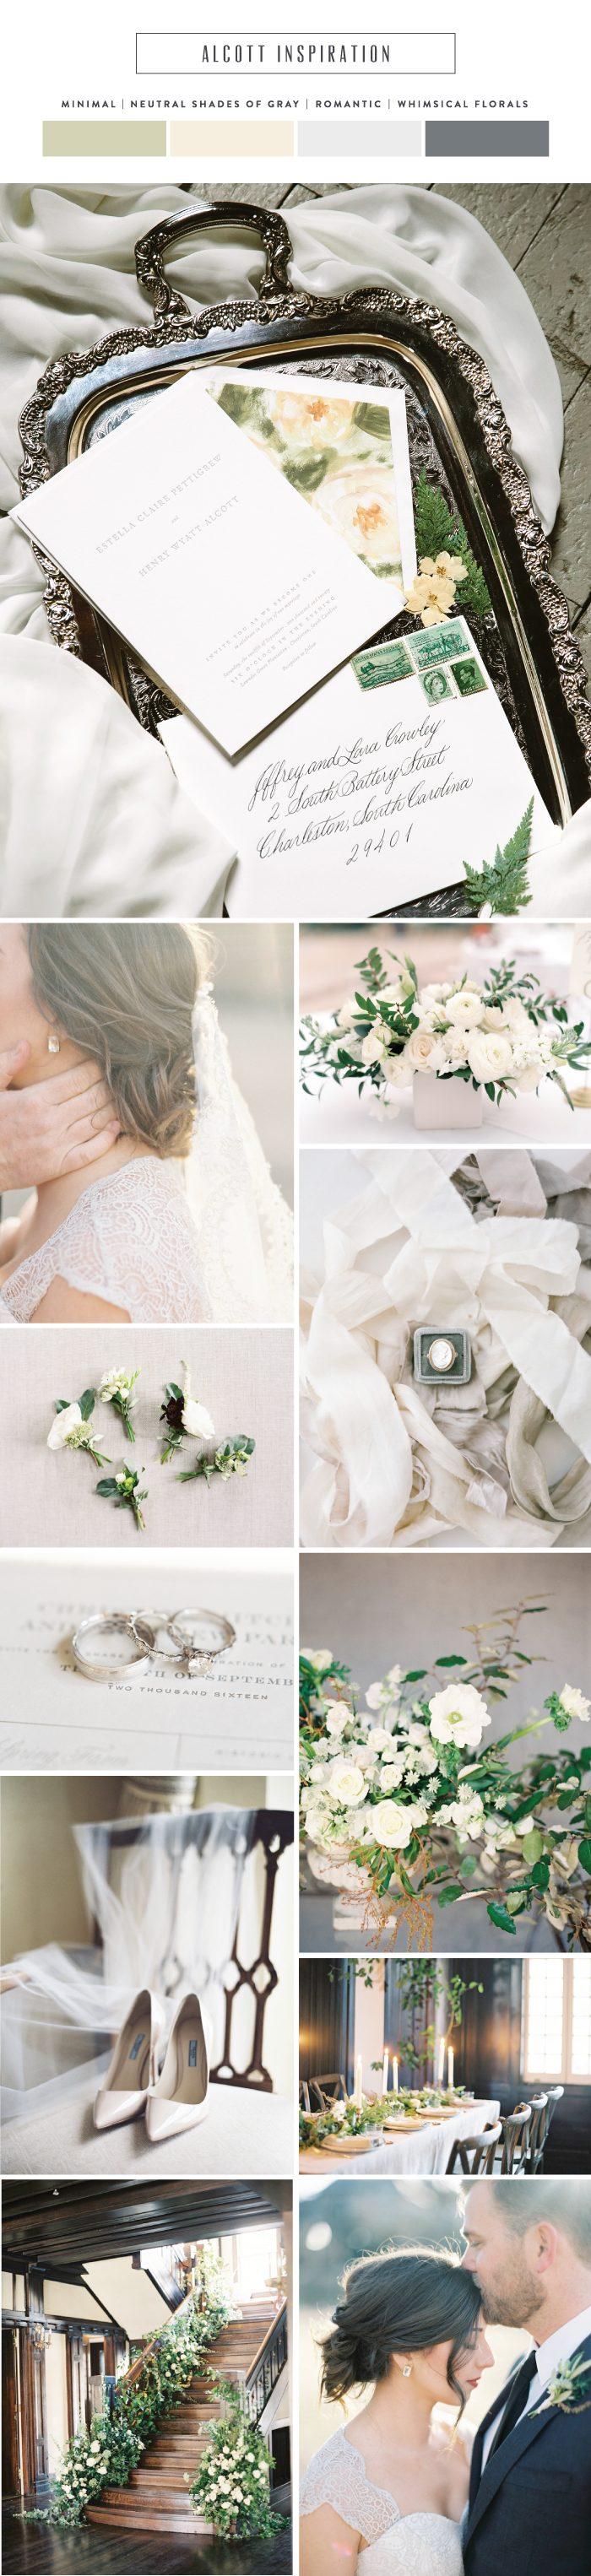 Introducing Alcott: modern and minimal letterpress wedding invitations | Bella Figura